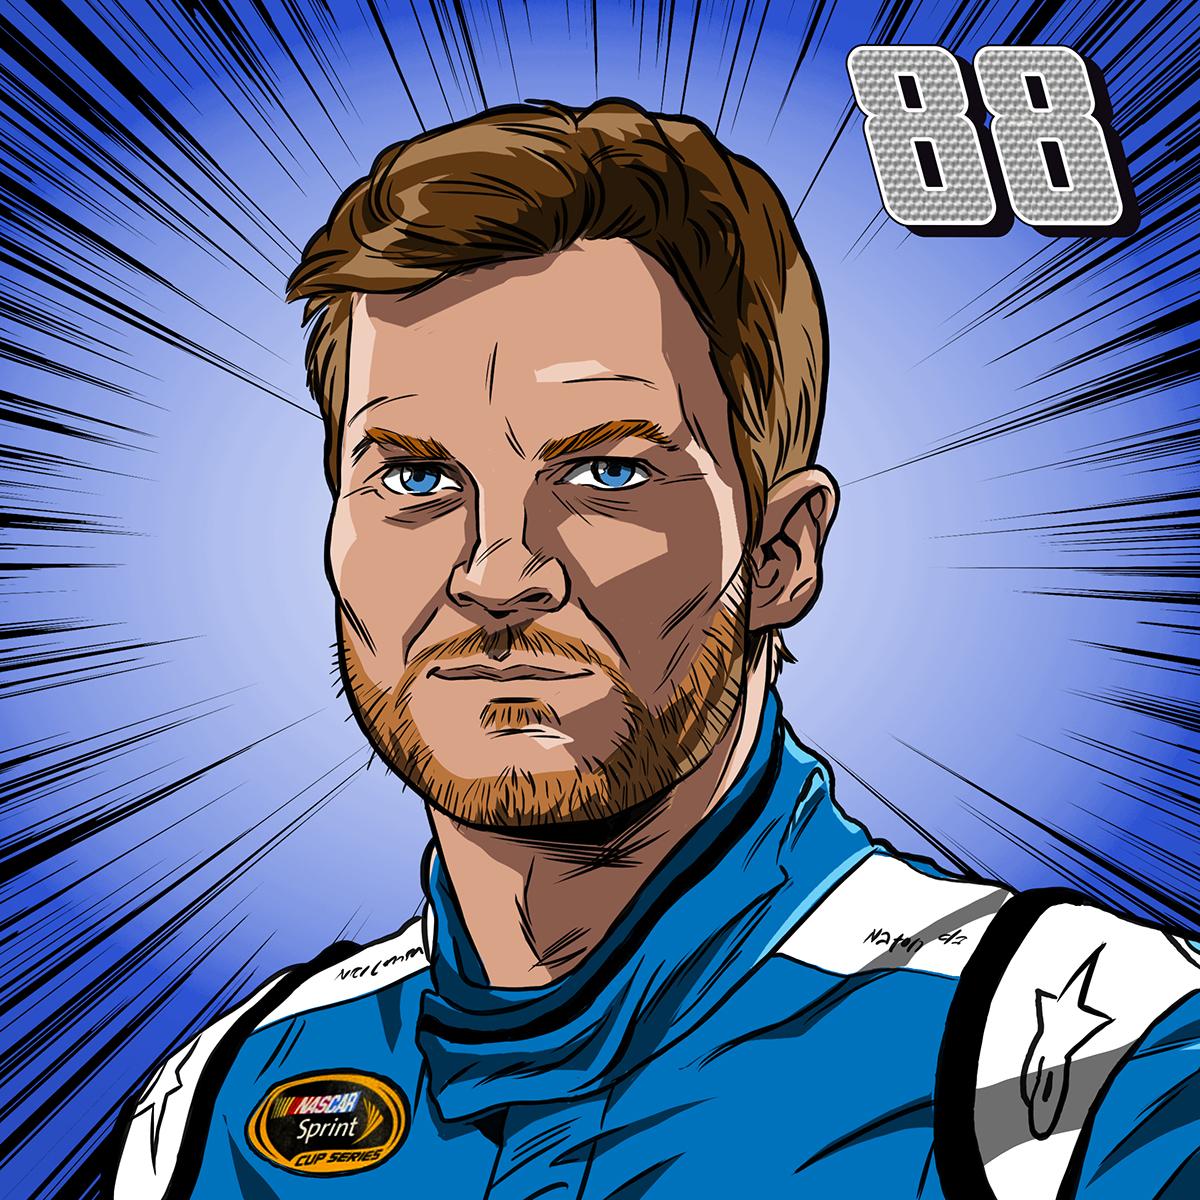 portraits,art,character designs,NASCAR,drivers,racecar,daytona500